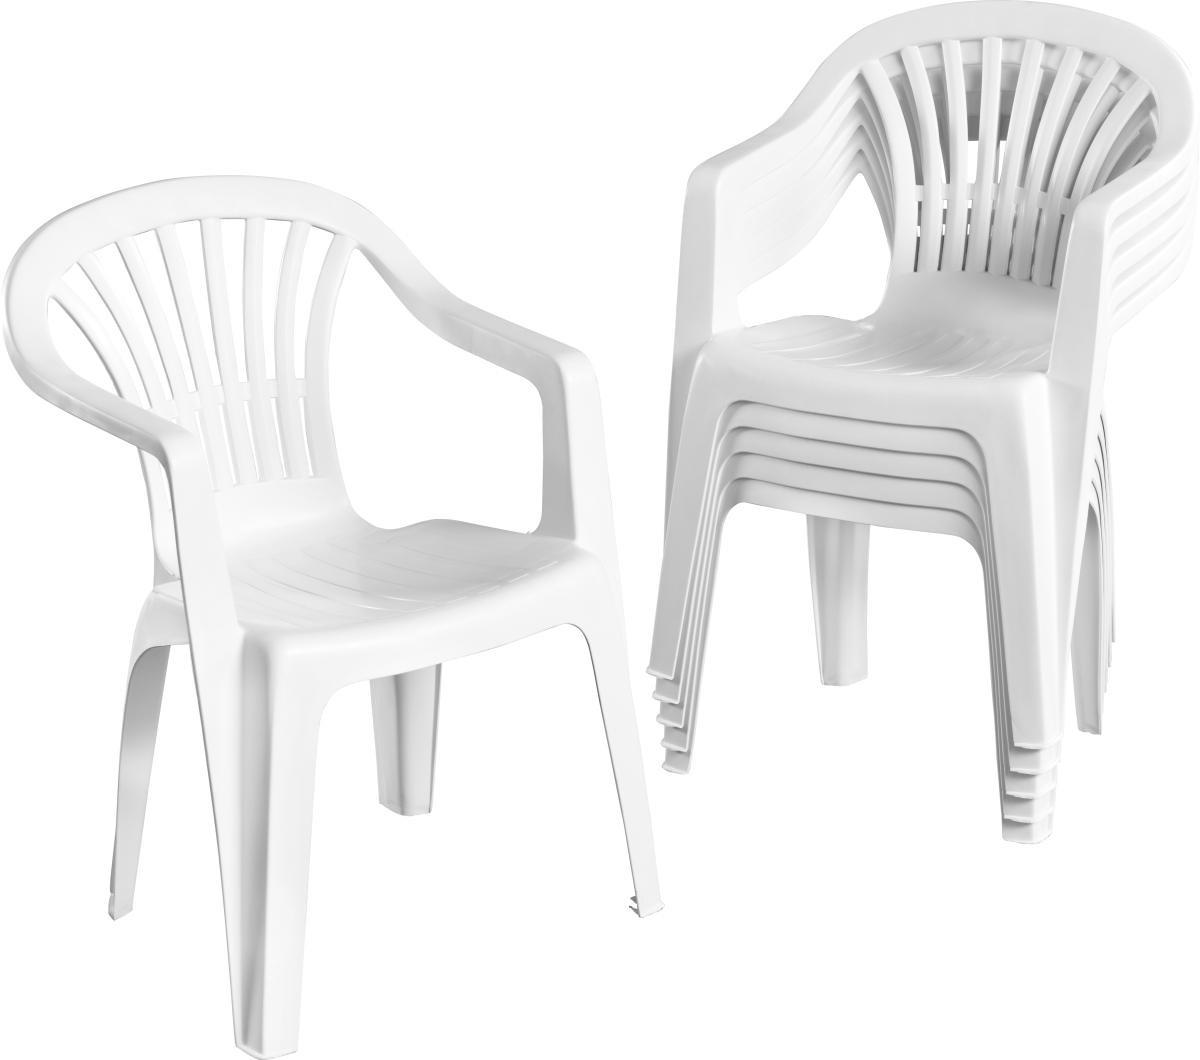 gartenstapelstuhl altea in wei f r 2 99 in allen poco dom ne gesch ften offline only. Black Bedroom Furniture Sets. Home Design Ideas